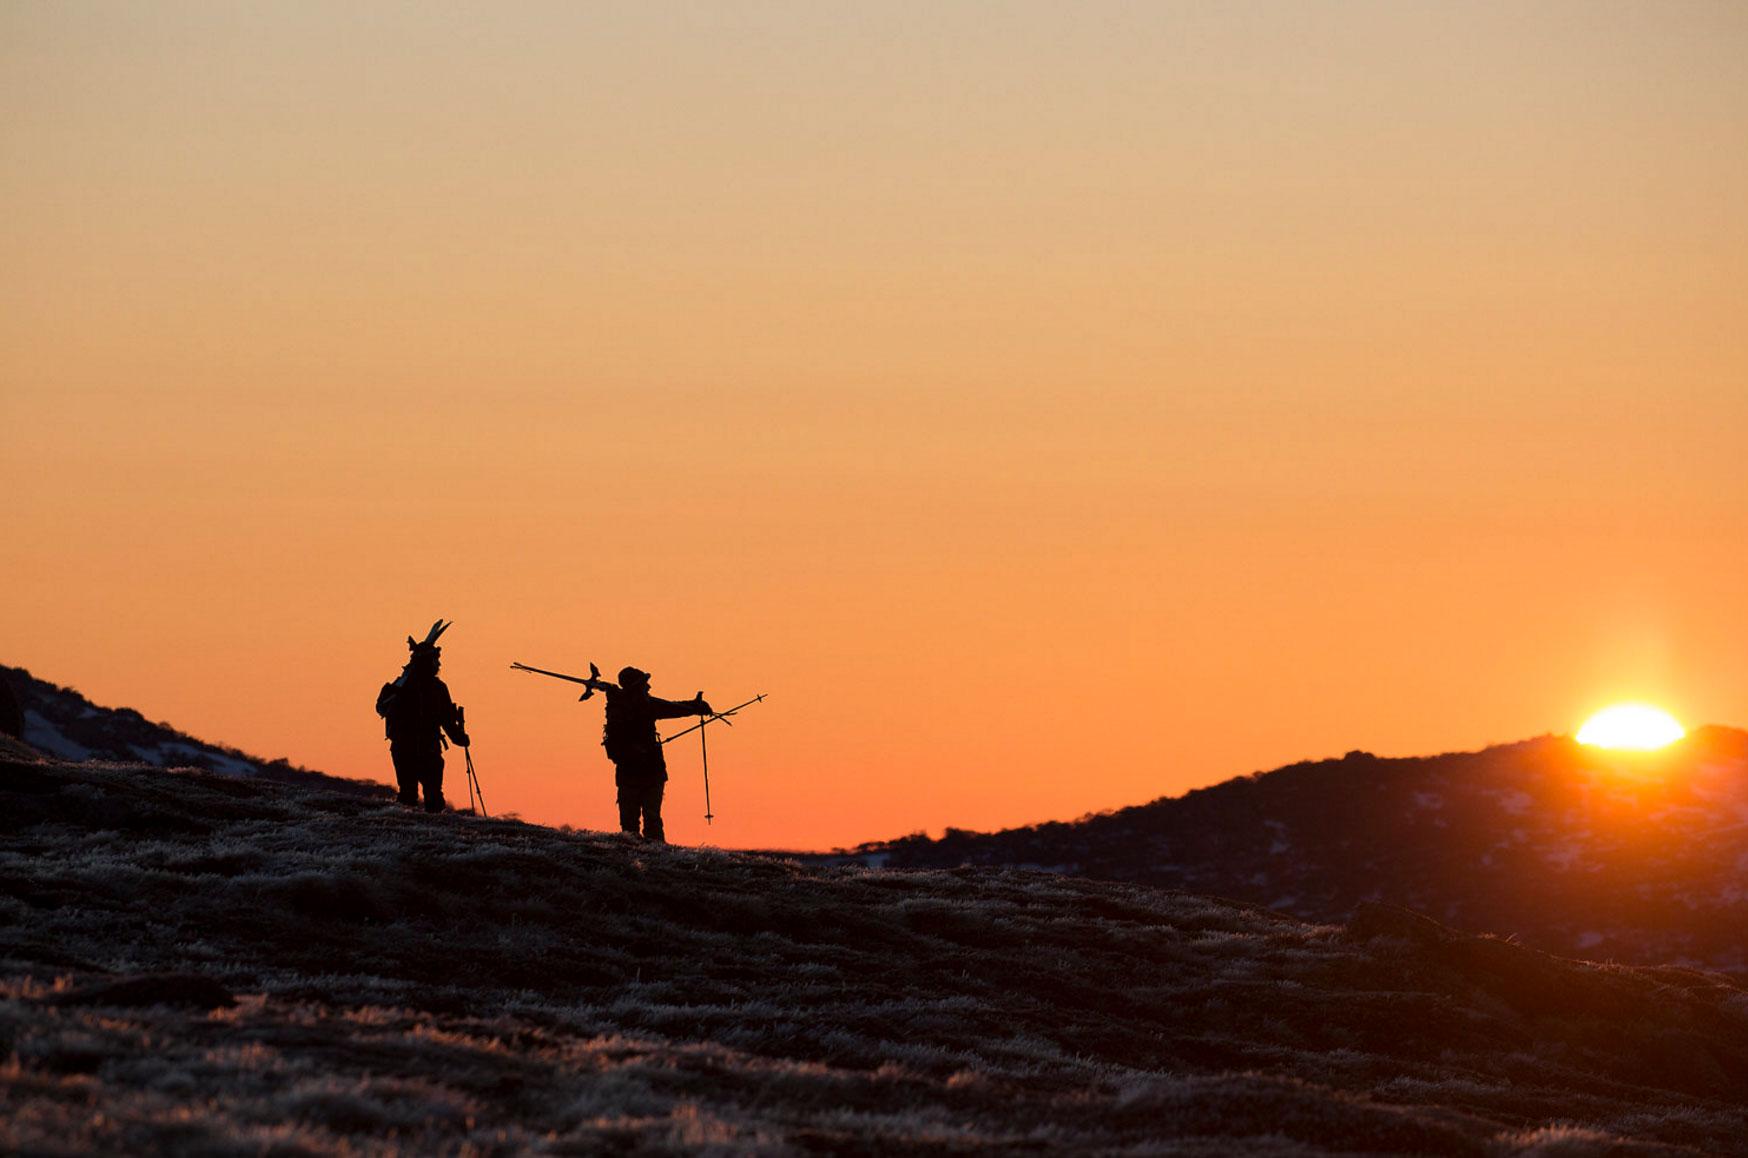 Nat and Anna Segal exploring the Australian backcountry, Photo: Teddy Laycock